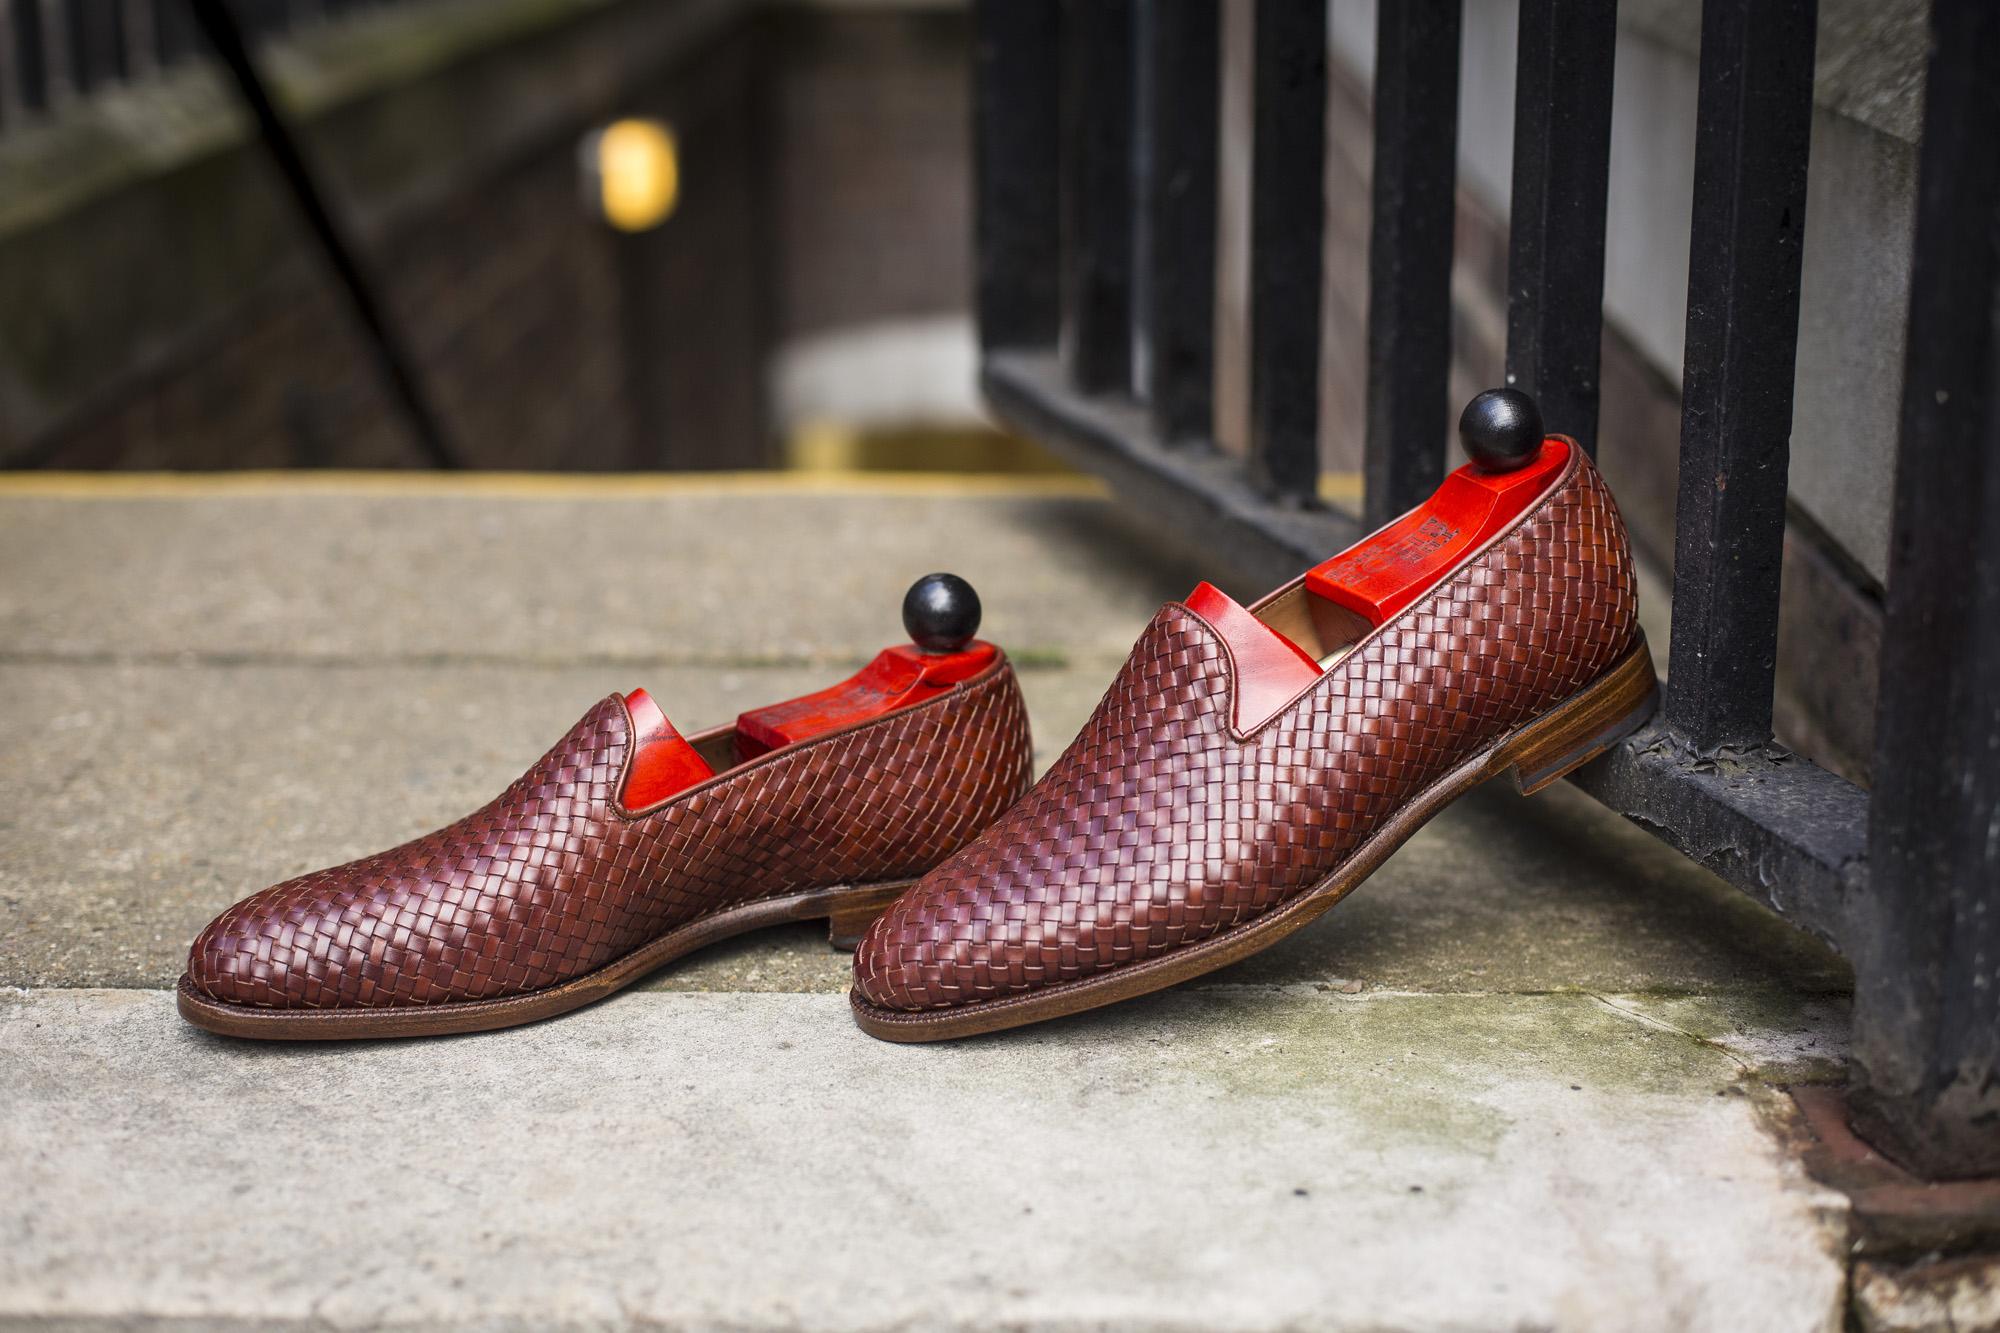 Discover the Laurelhurst II Braided Loafers - J.FitzPatrick Footwear